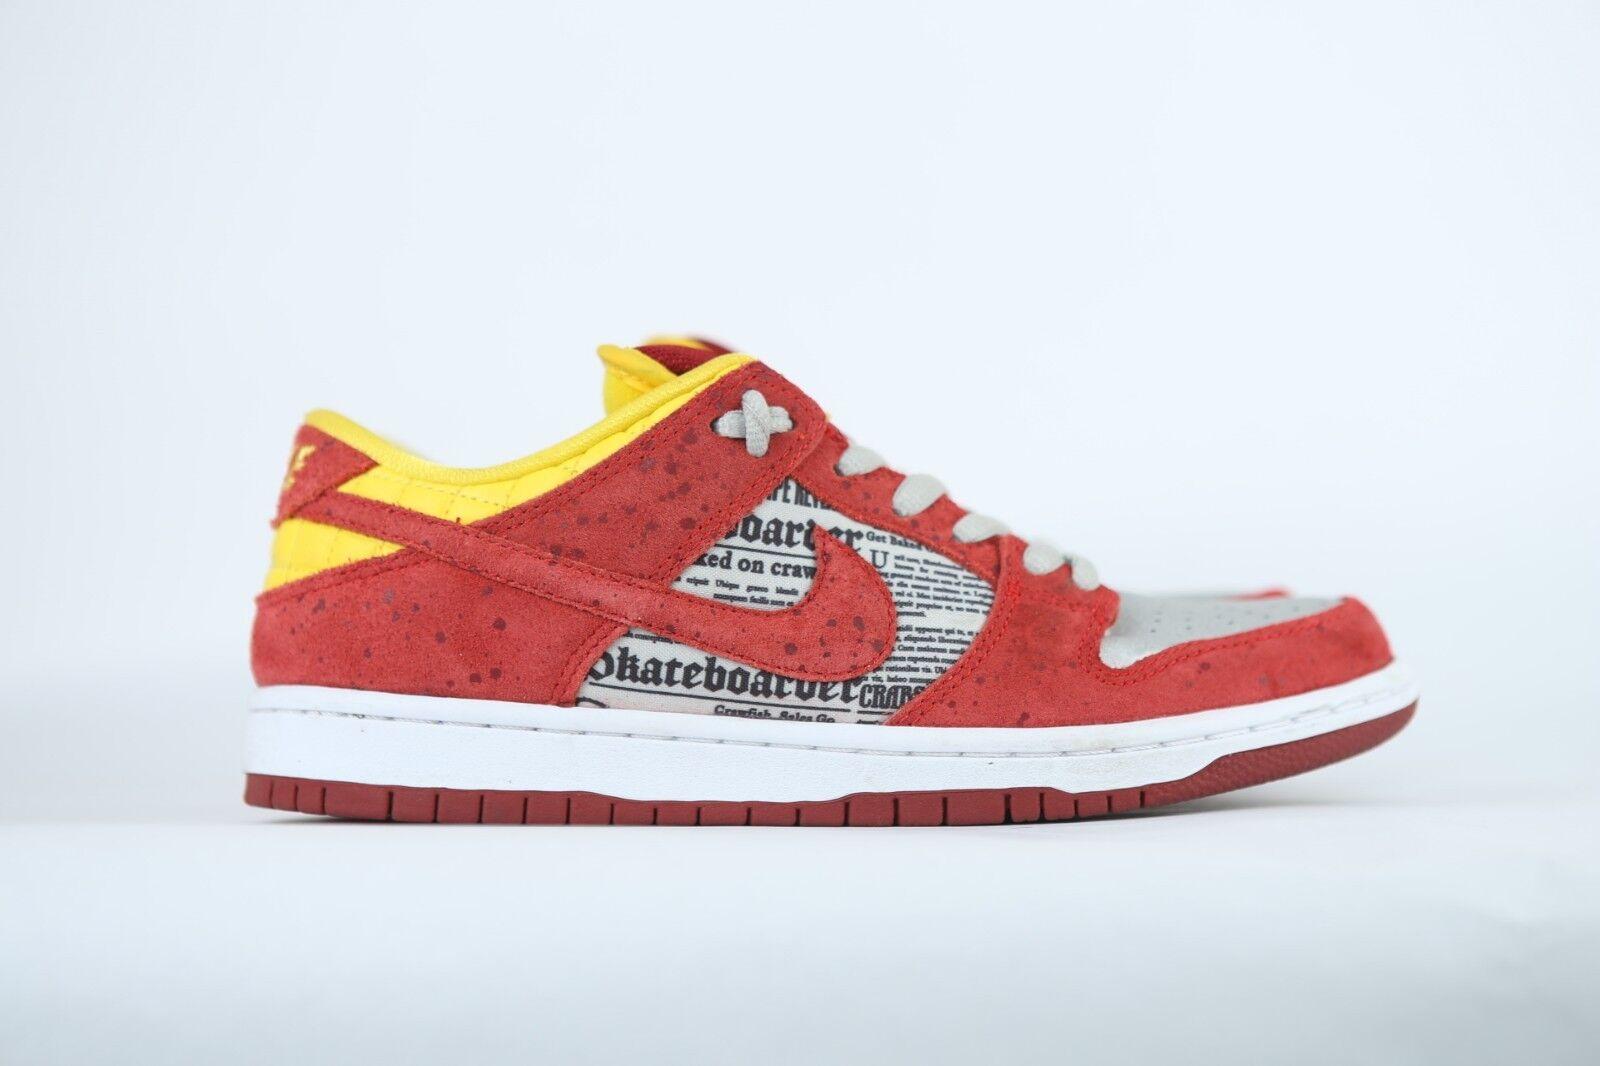 Nike SB Dunk Low Premium QS Rukus 504750-660 Red Yellow NDS US 7.5 Mens 2014 NDS